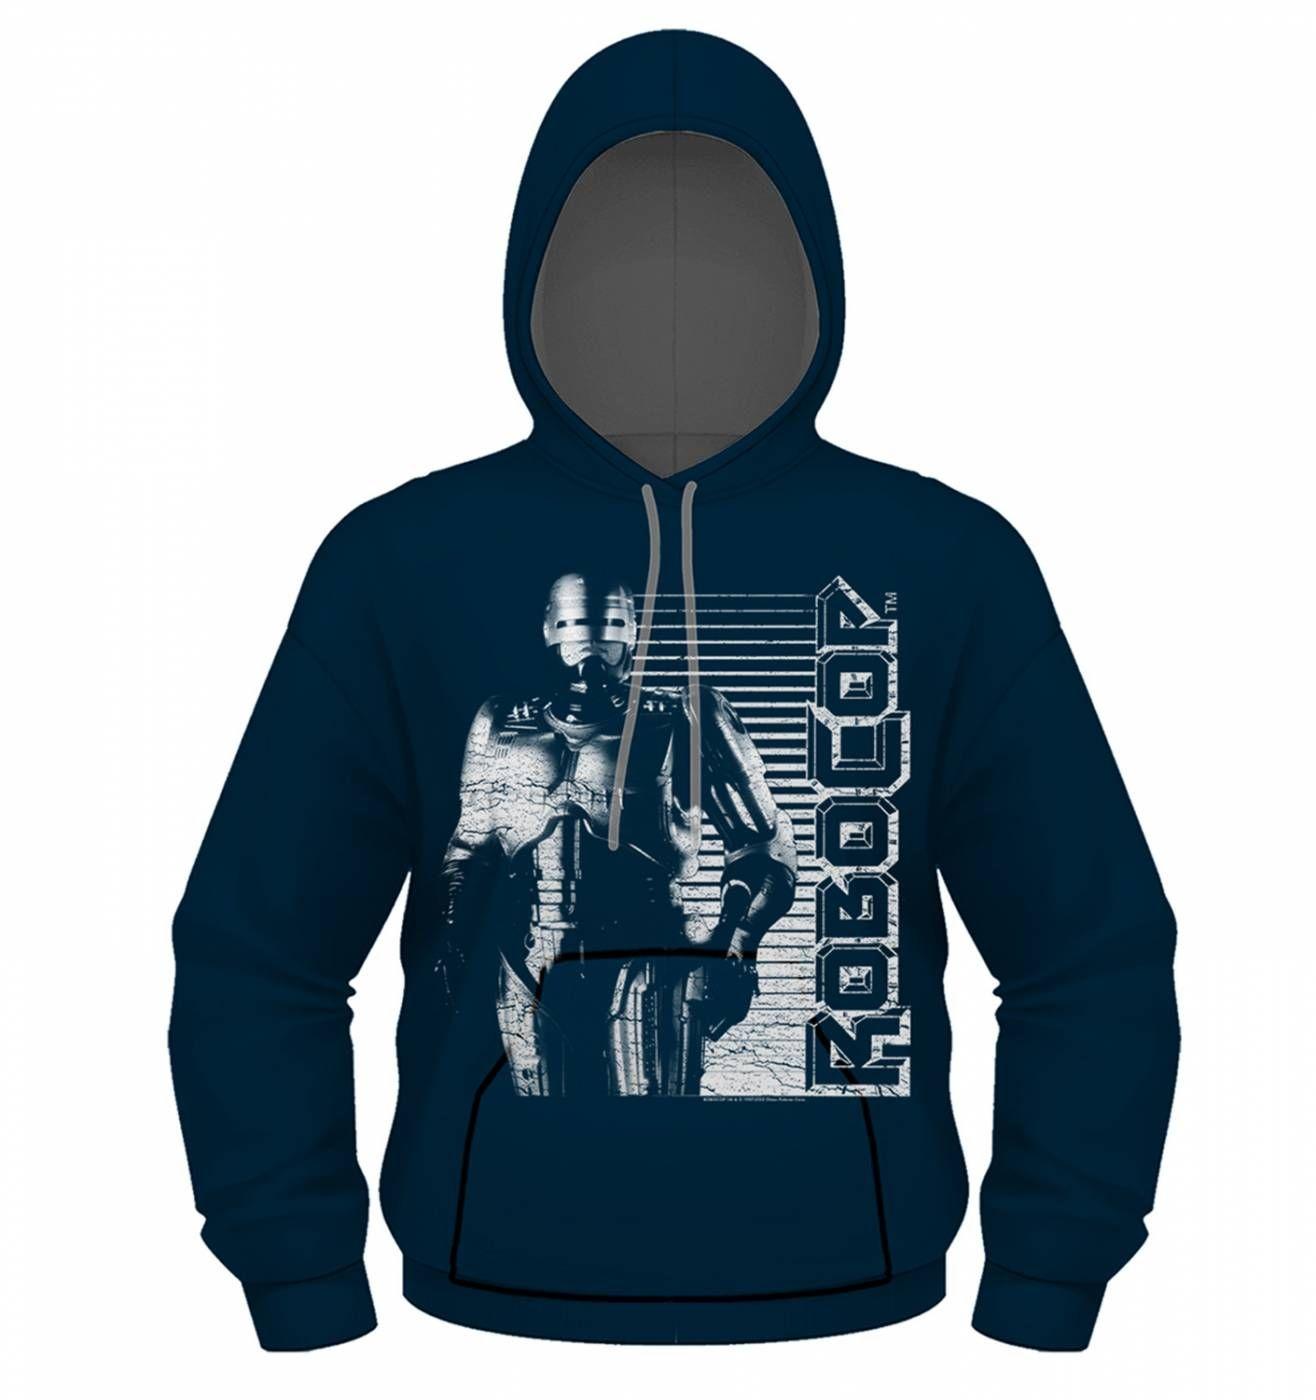 OFFICIAL Robocop Vintage hoodie